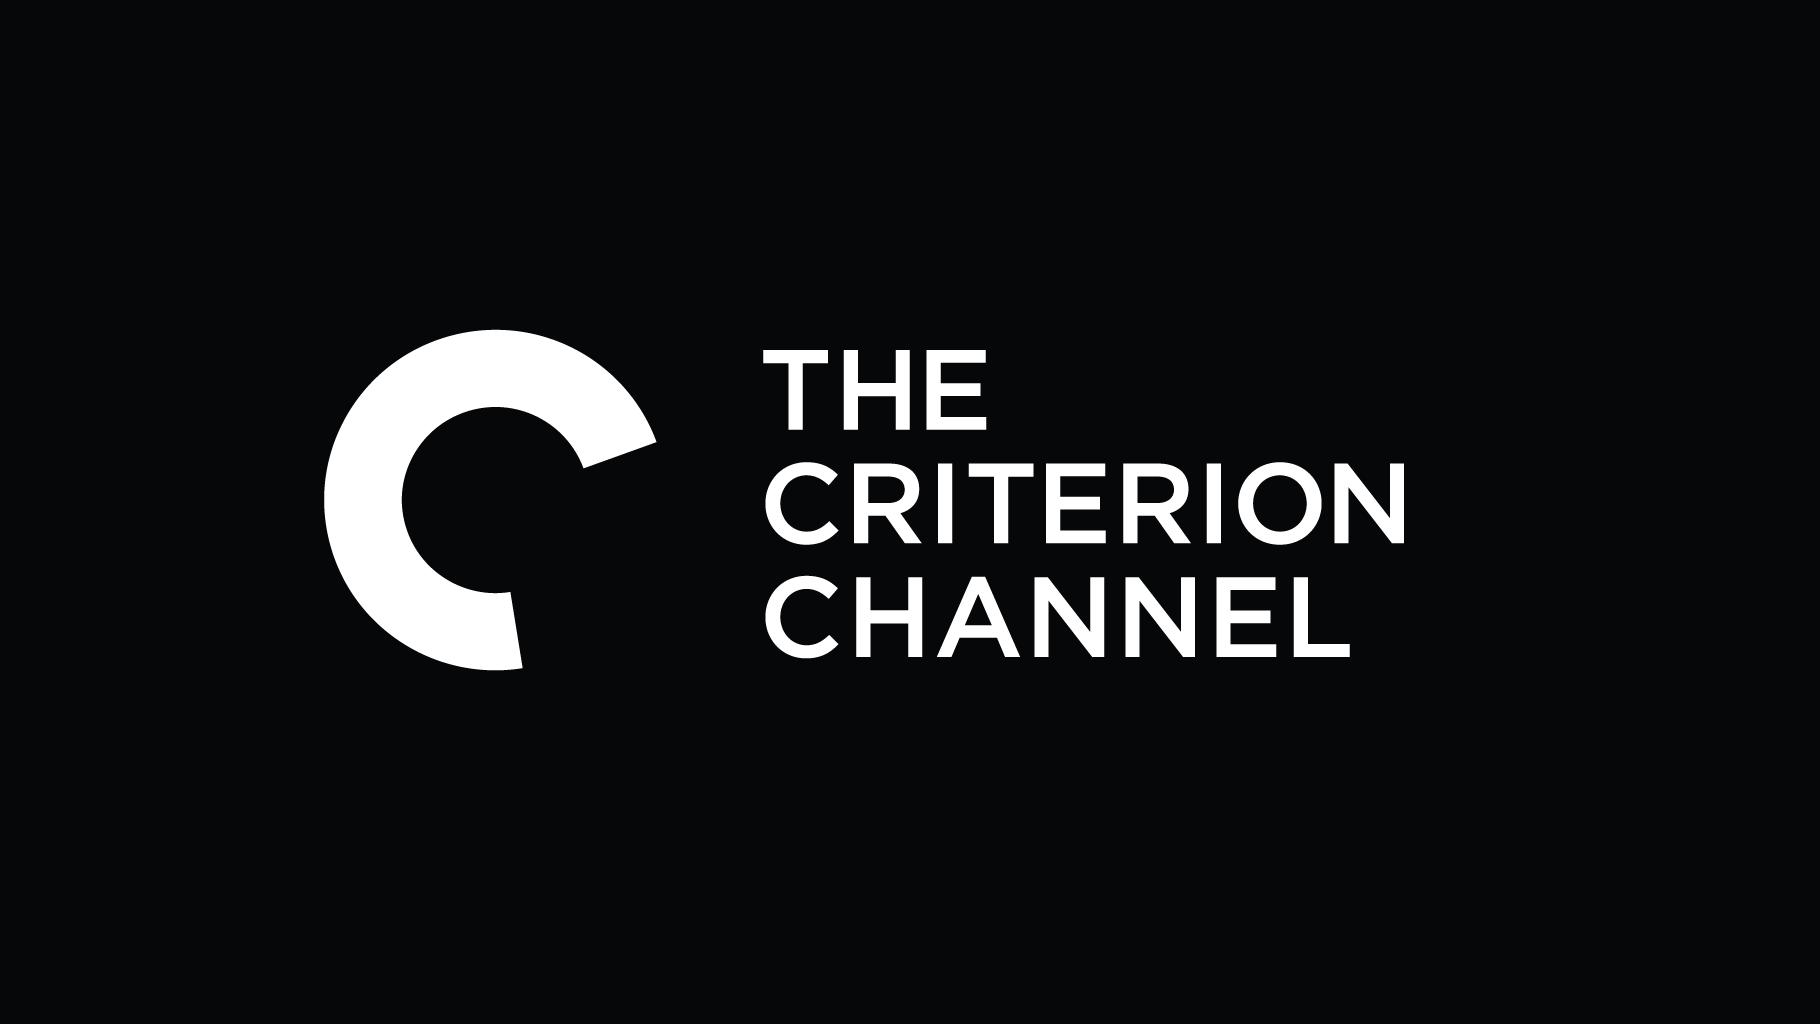 Criterion channel logo